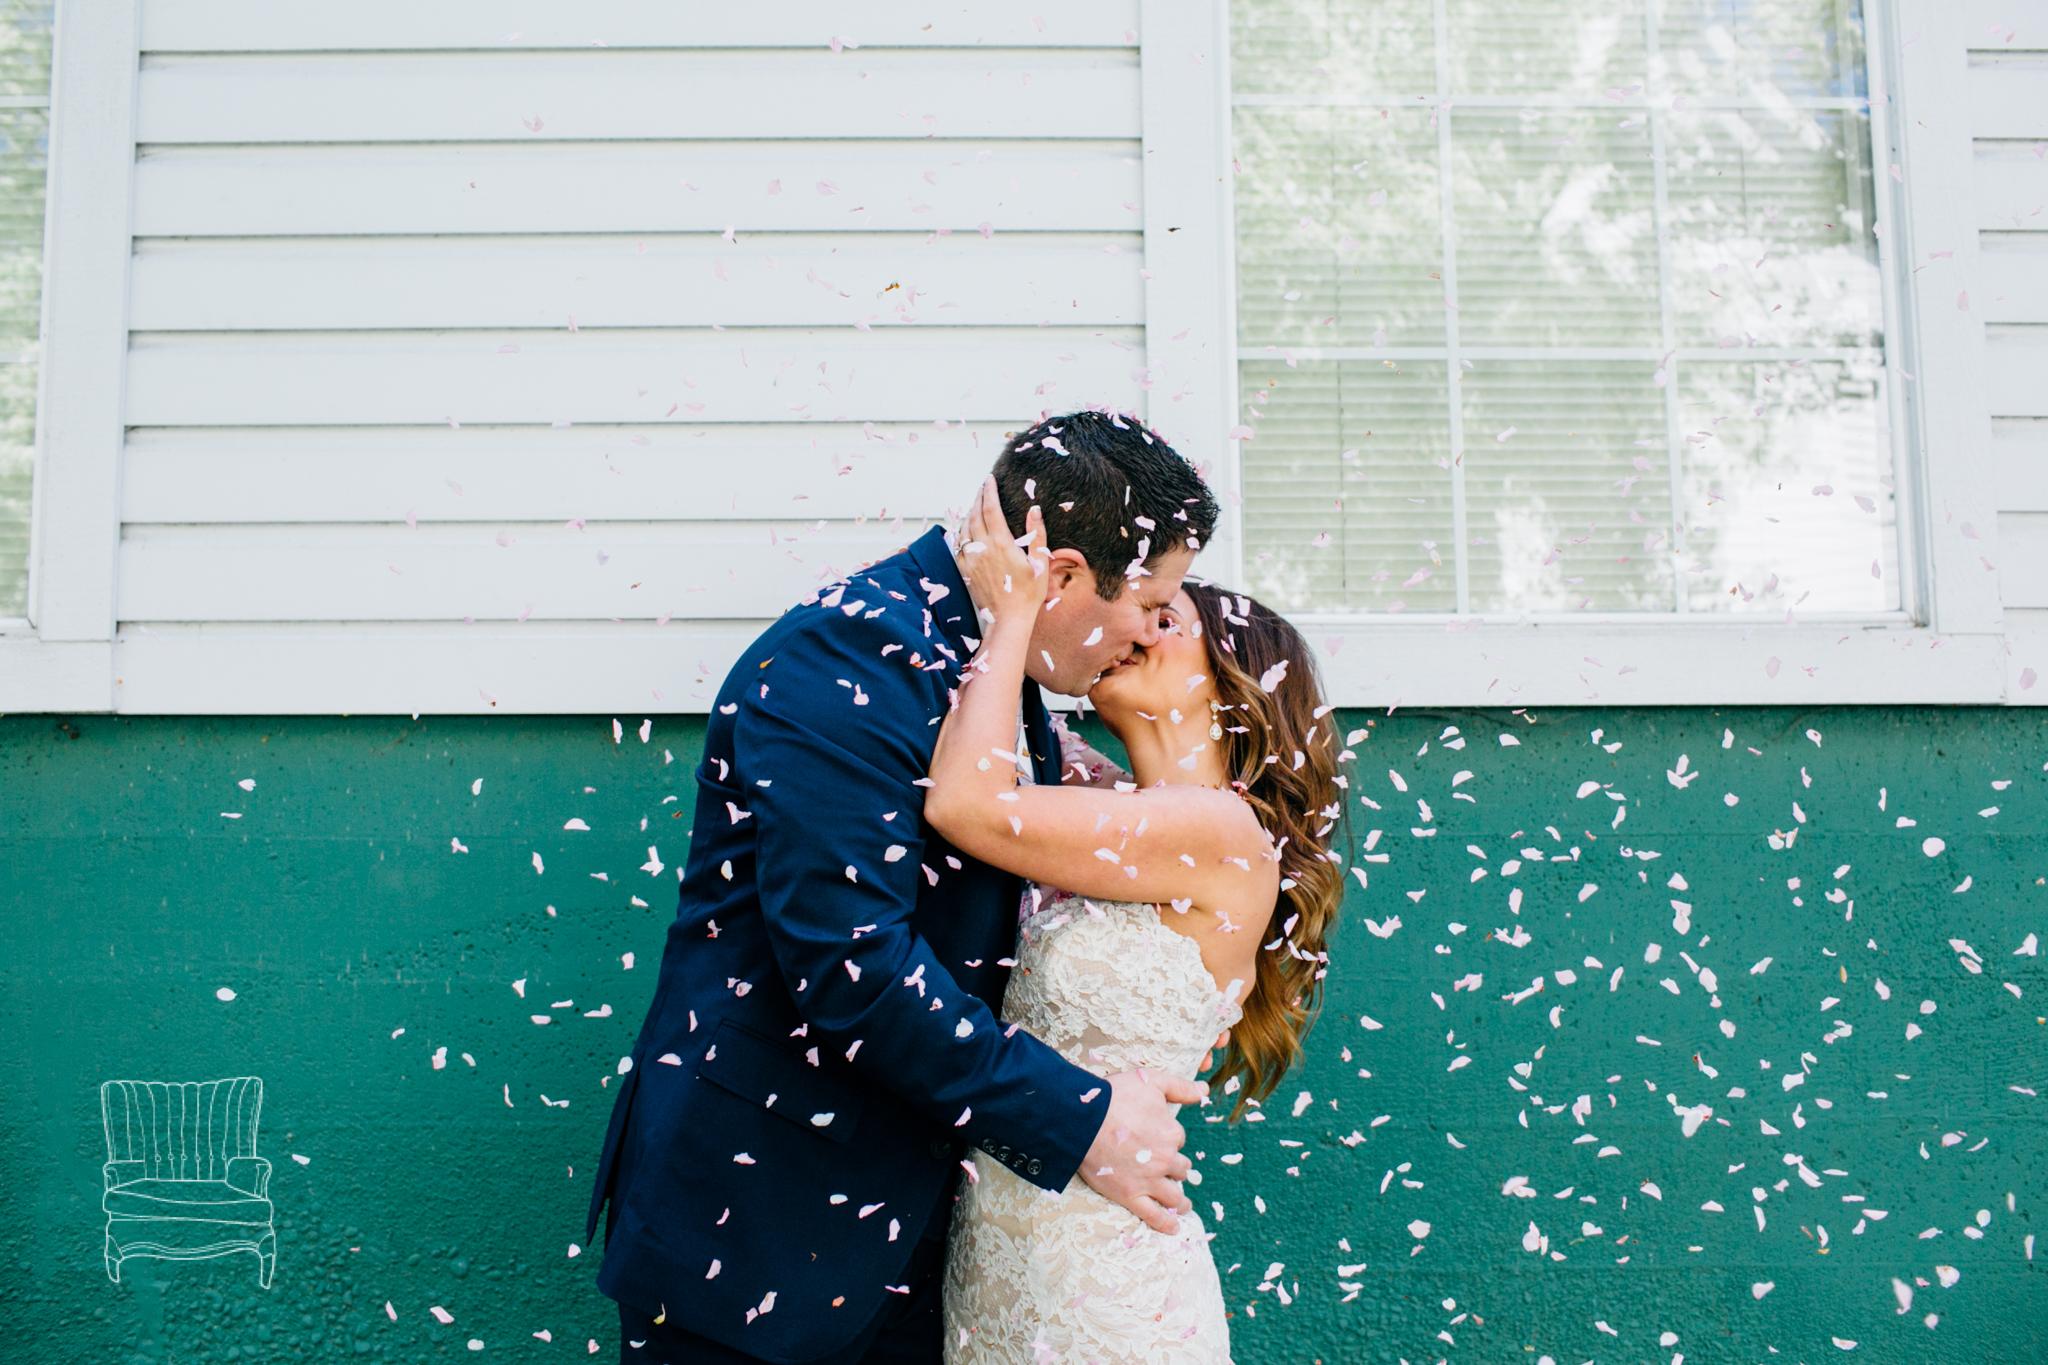 seattle-wedding-photographer-katheryn-moran-russells-bothell-wilkins-wedding-photo-32.jpg